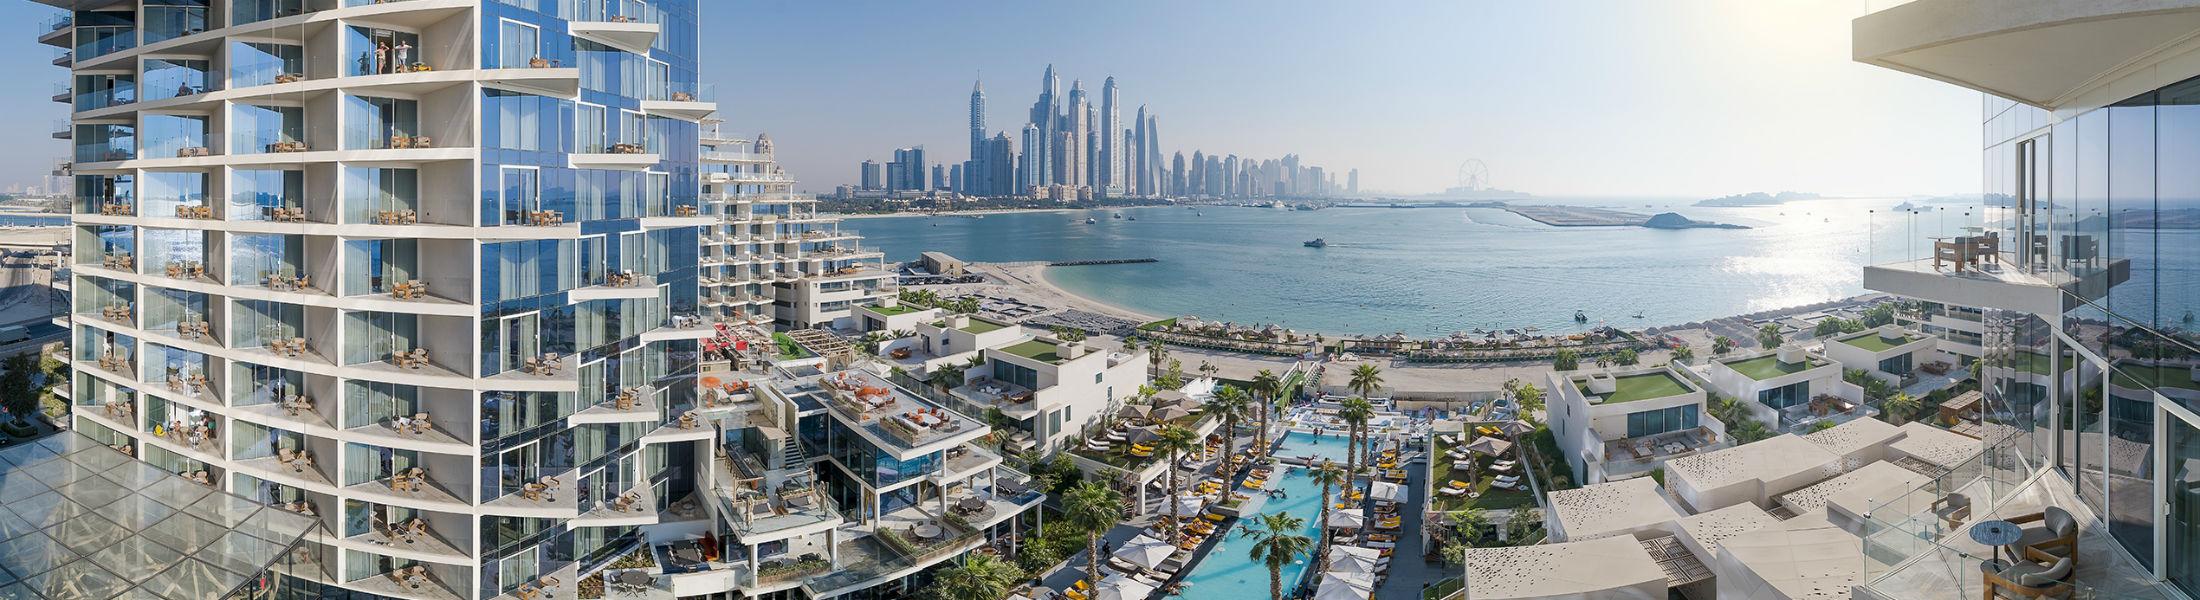 View from the Five Palm Jumeirah of Dubai Marina